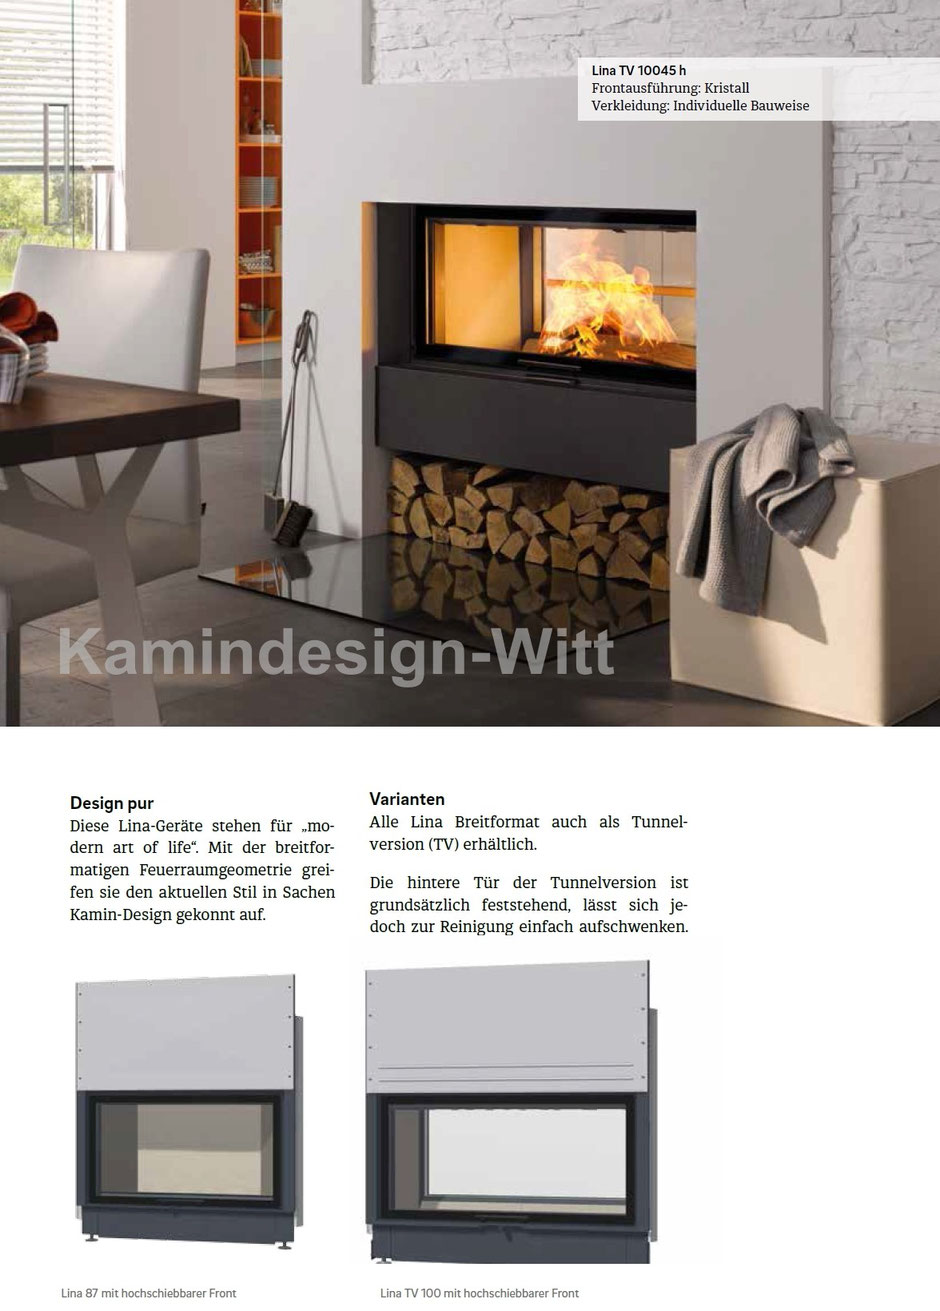 Schmid-Lina-100-Kamineinsatz